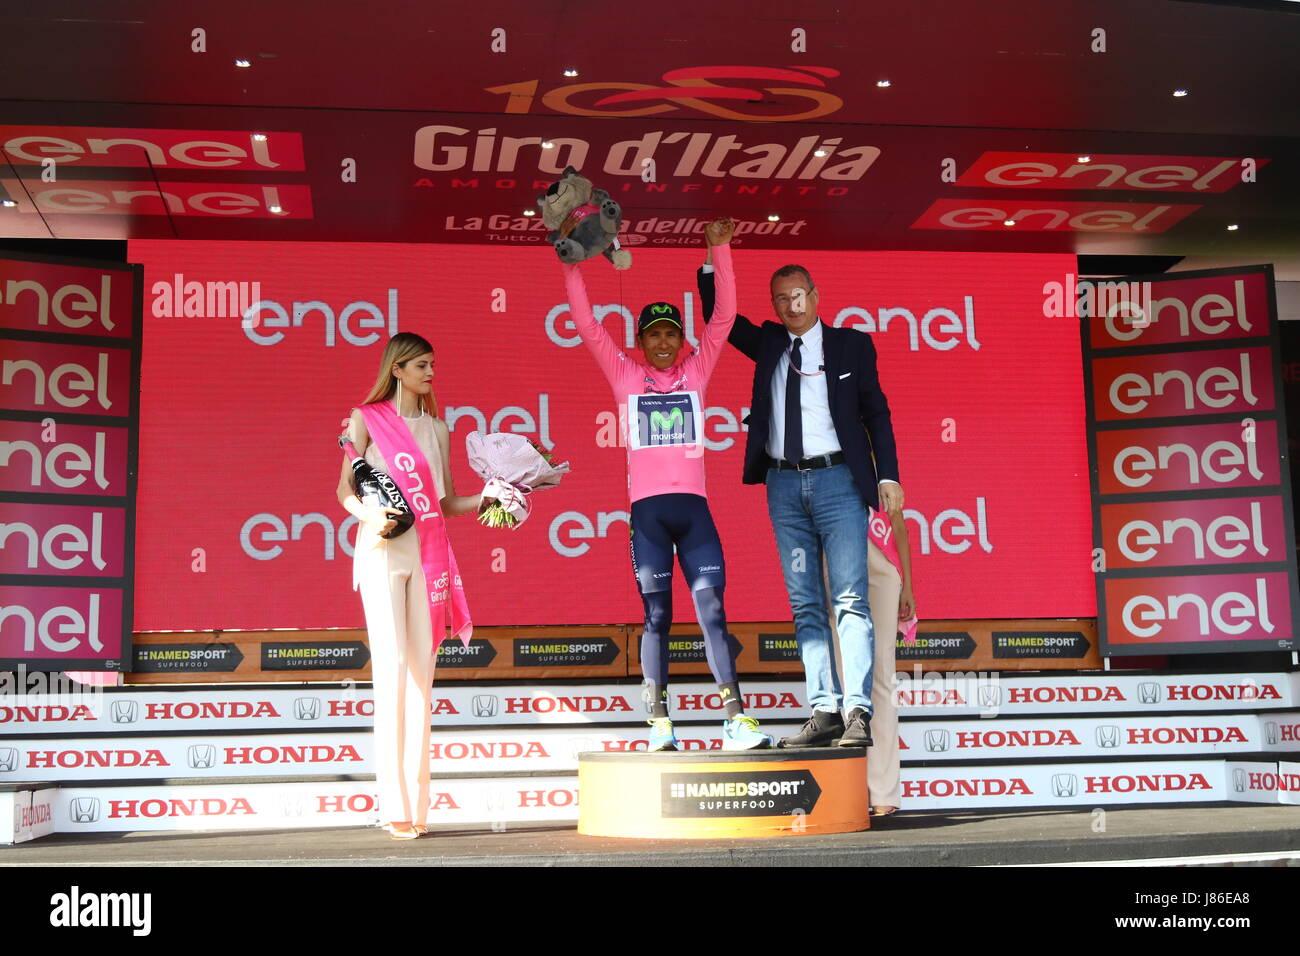 Nairo Quintana Stock Photos & Nairo Quintana Stock Images ...